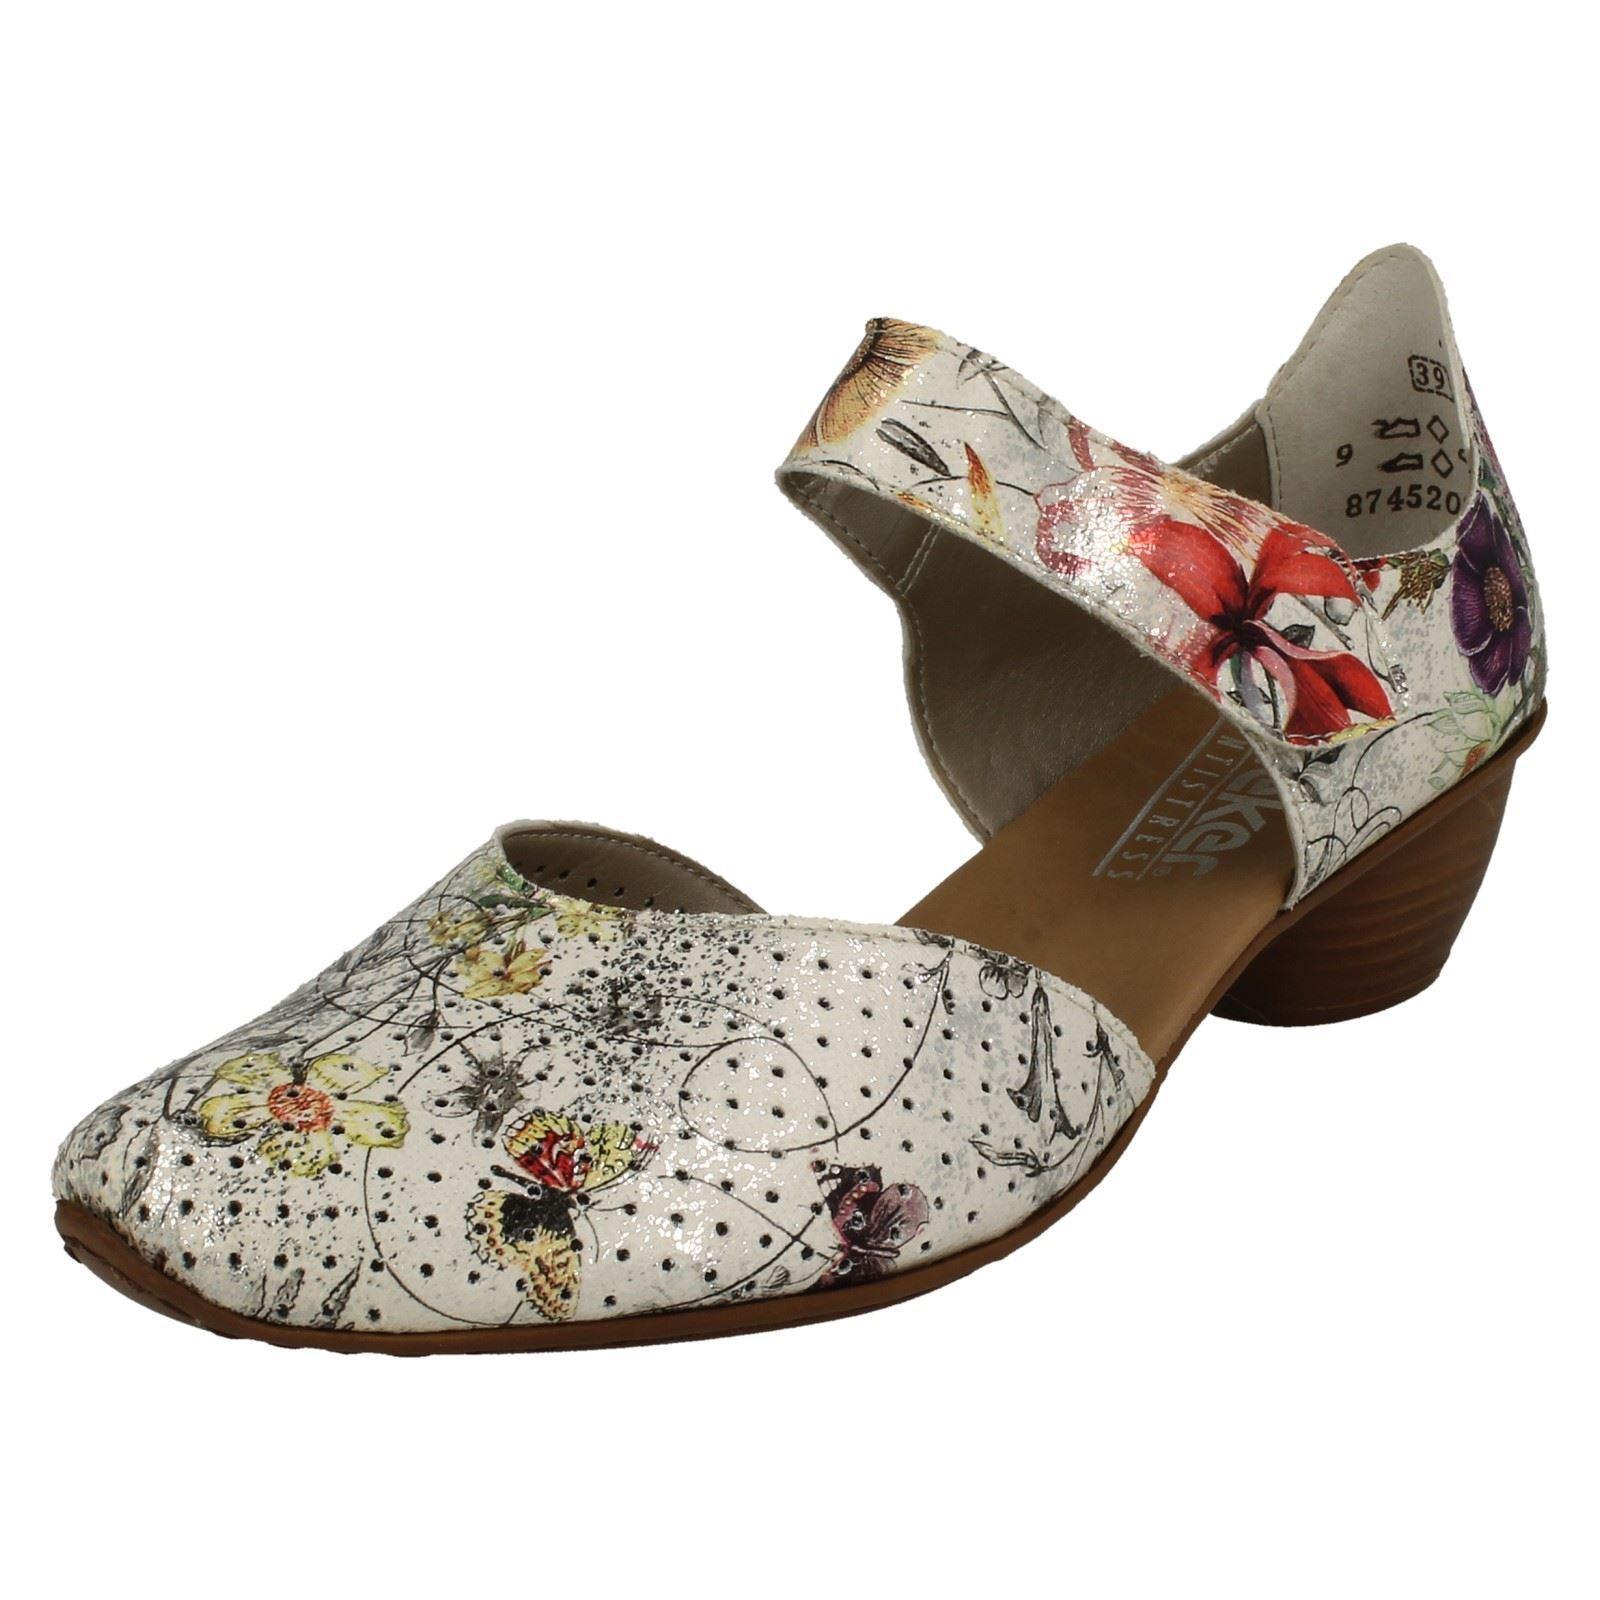 Womens Rieker Casual Heeled Heeled Casual Shoes '43789' c6a3eb